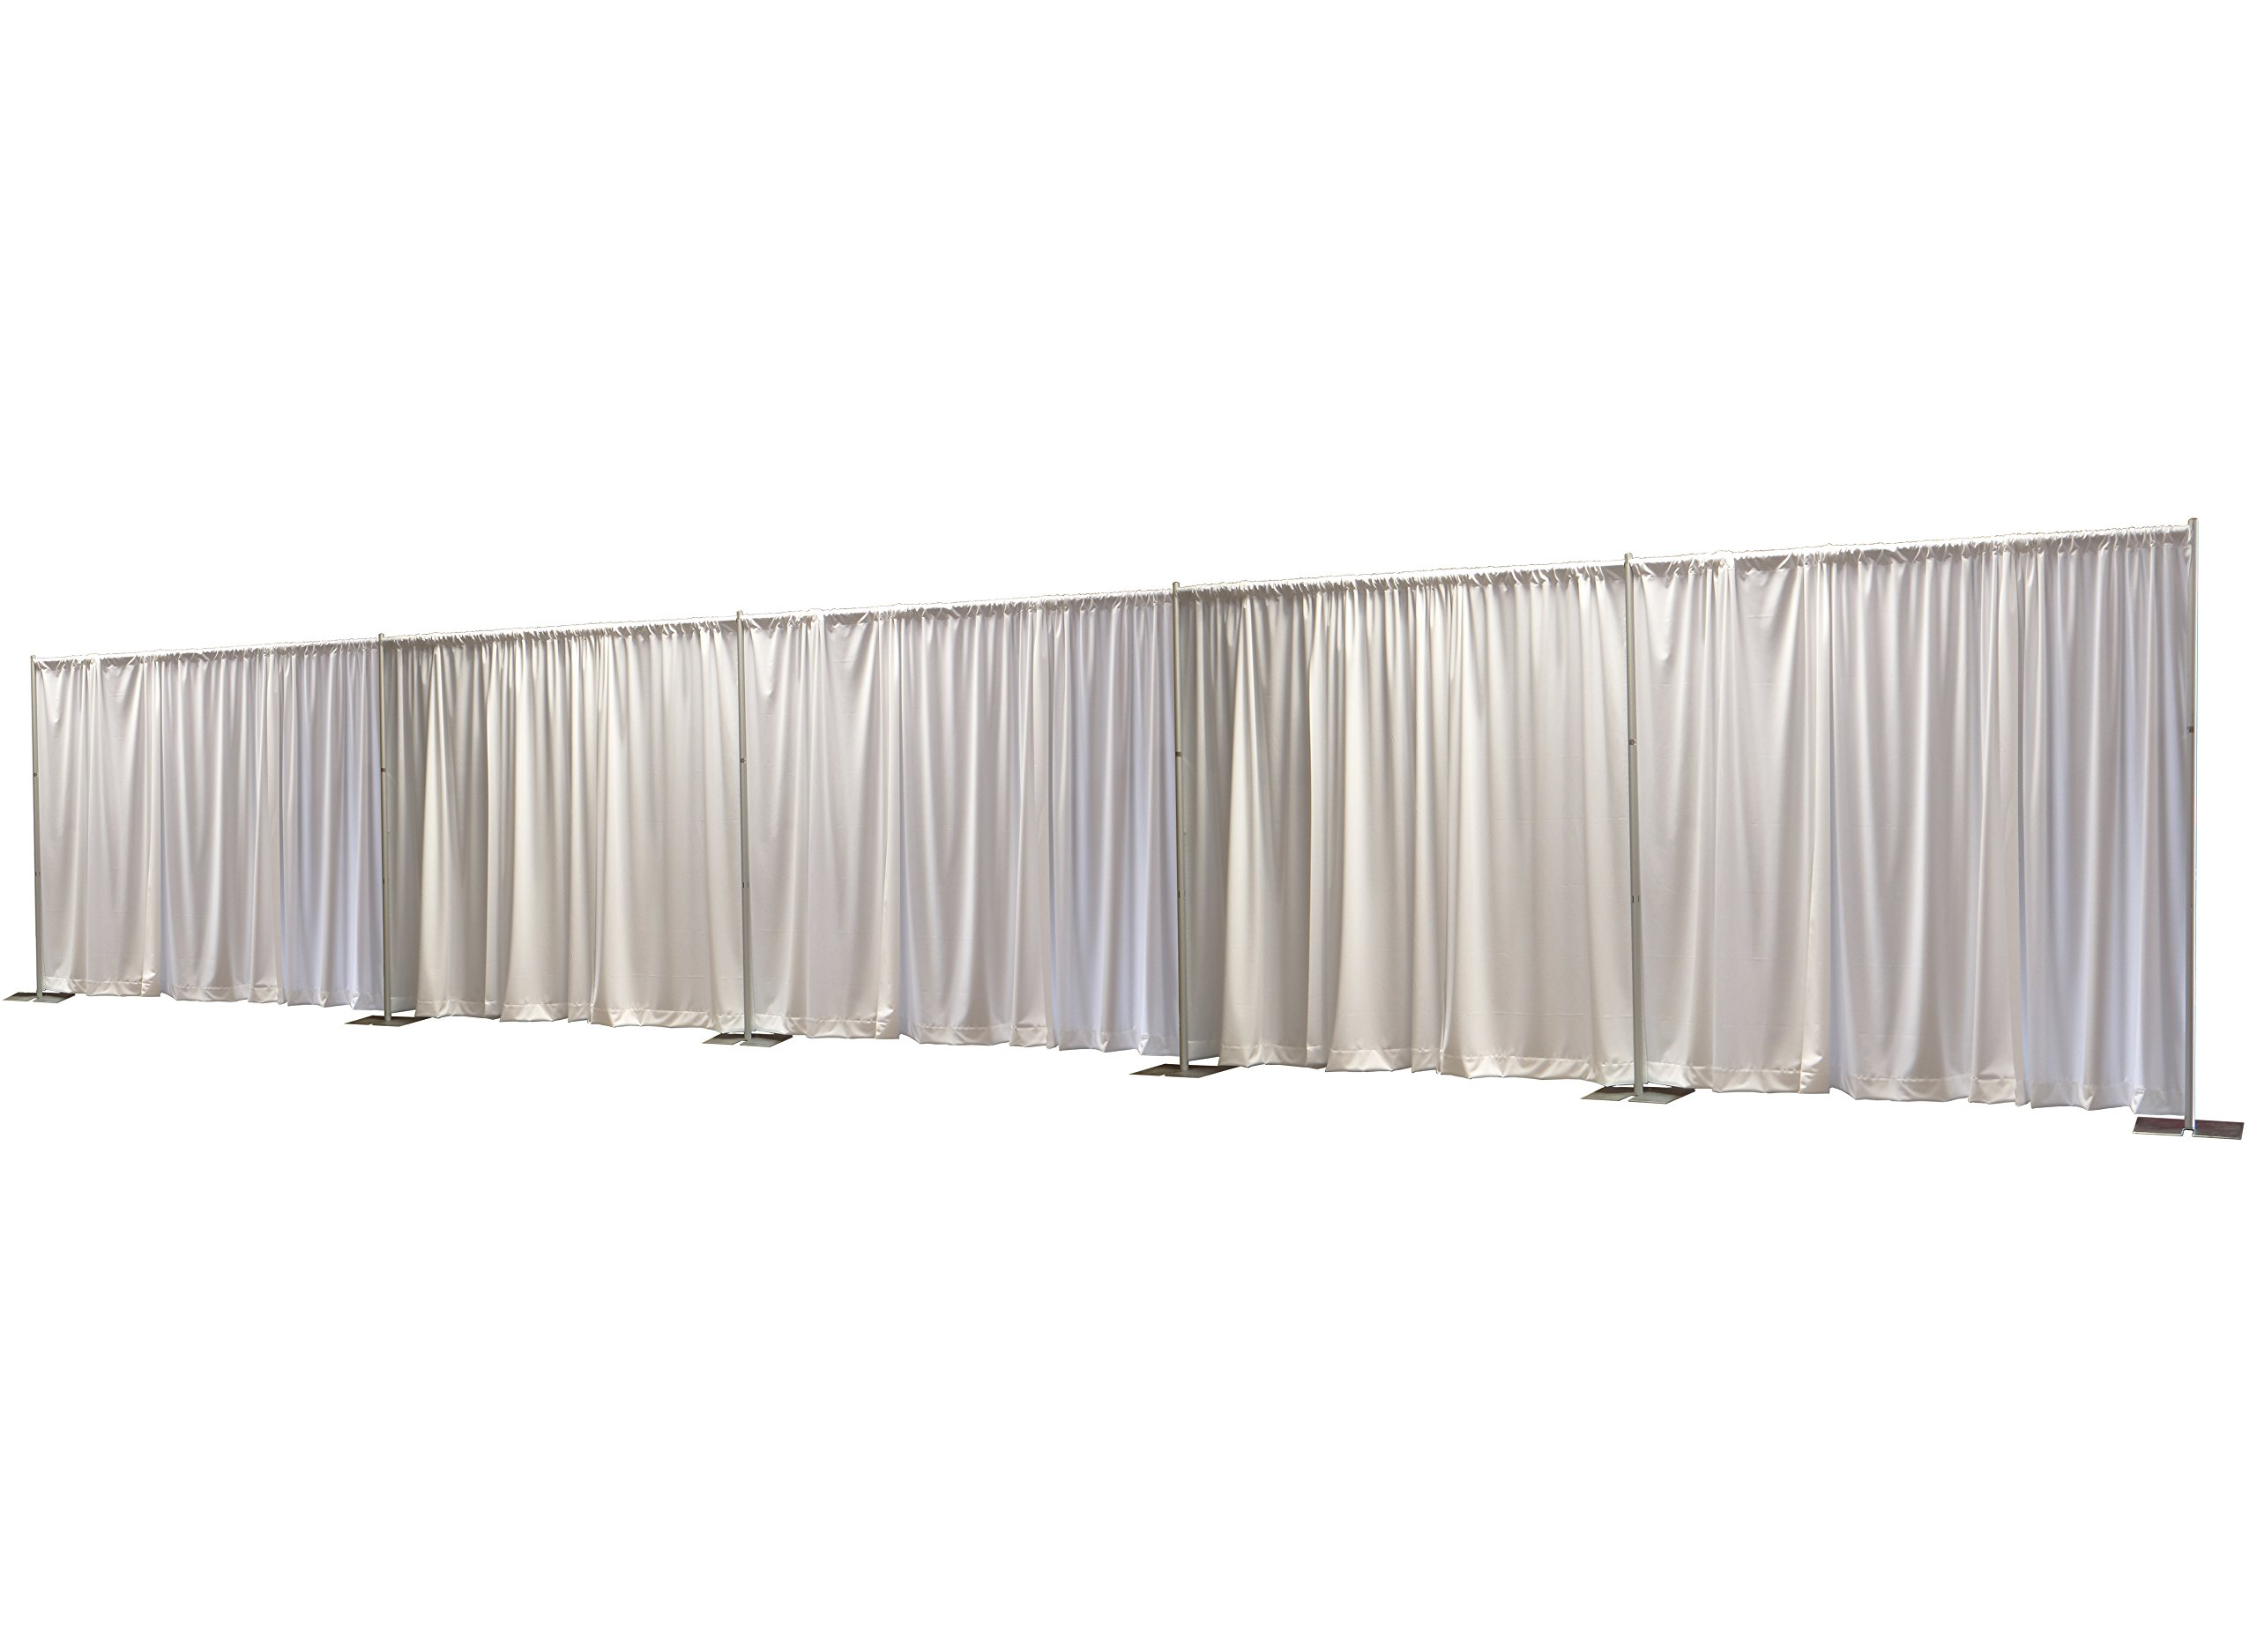 OnlineEEI, Premier Pipe and Drape Backdrop or Room Divider Kit, 8ft x 50ft, White Premier Drapes